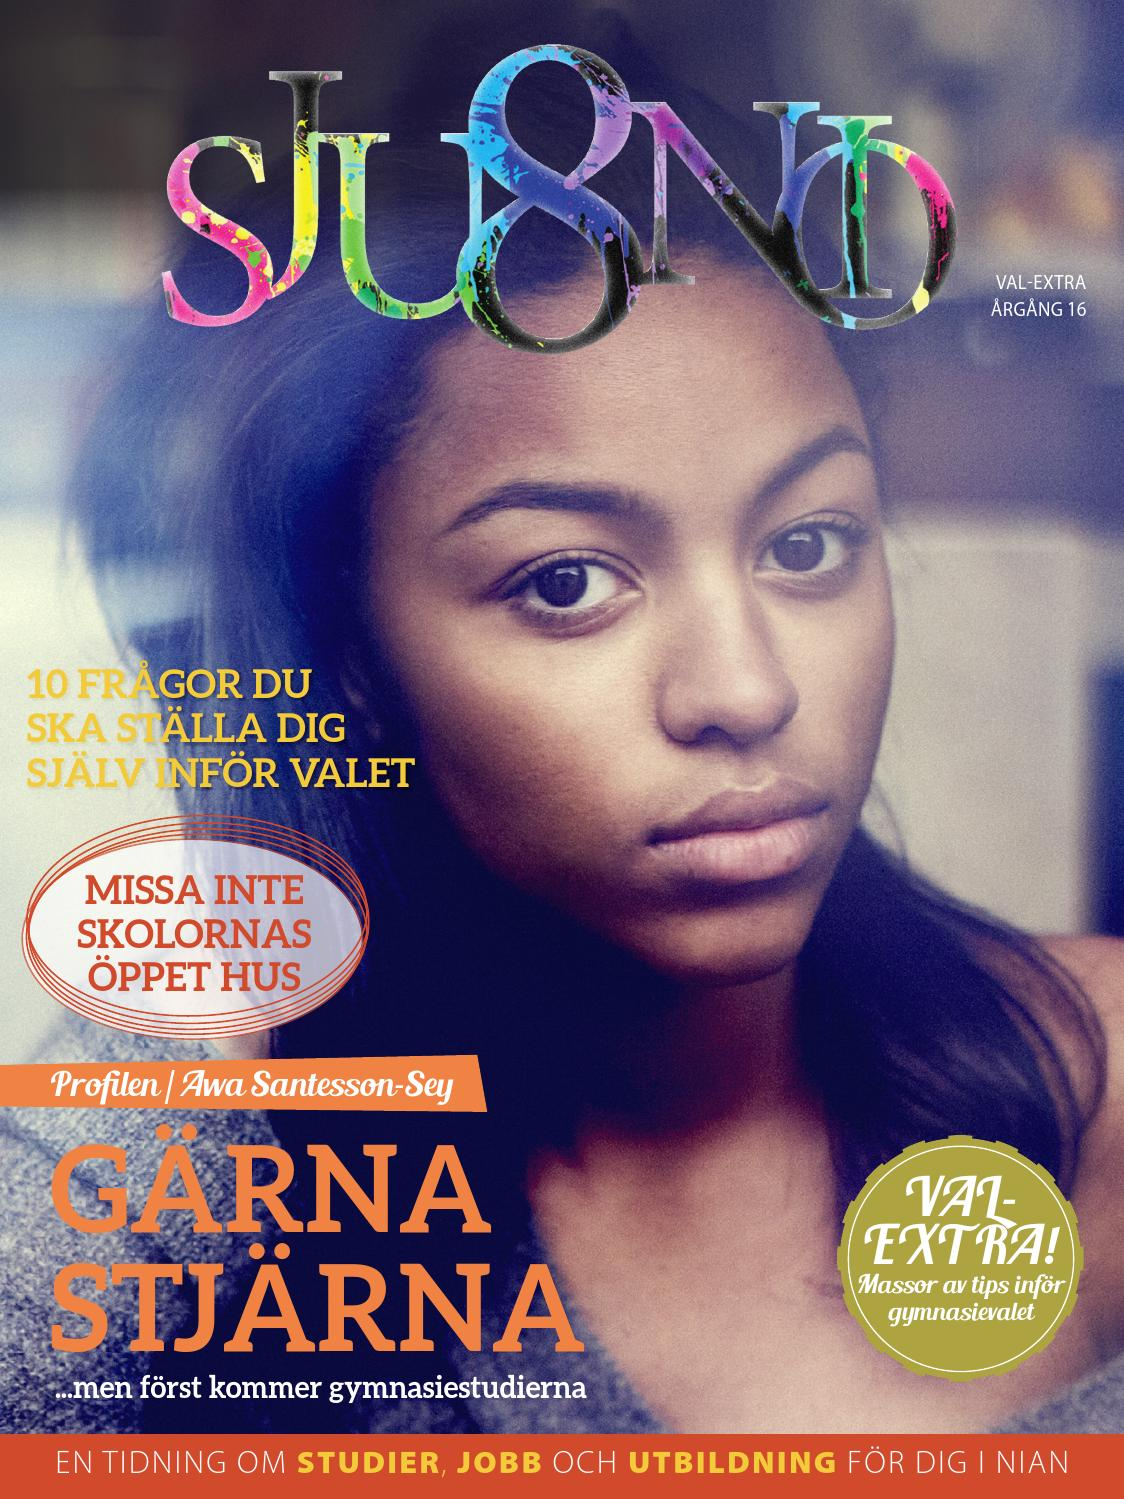 Sju8nio mässextra 2015 by just rivista   issuu